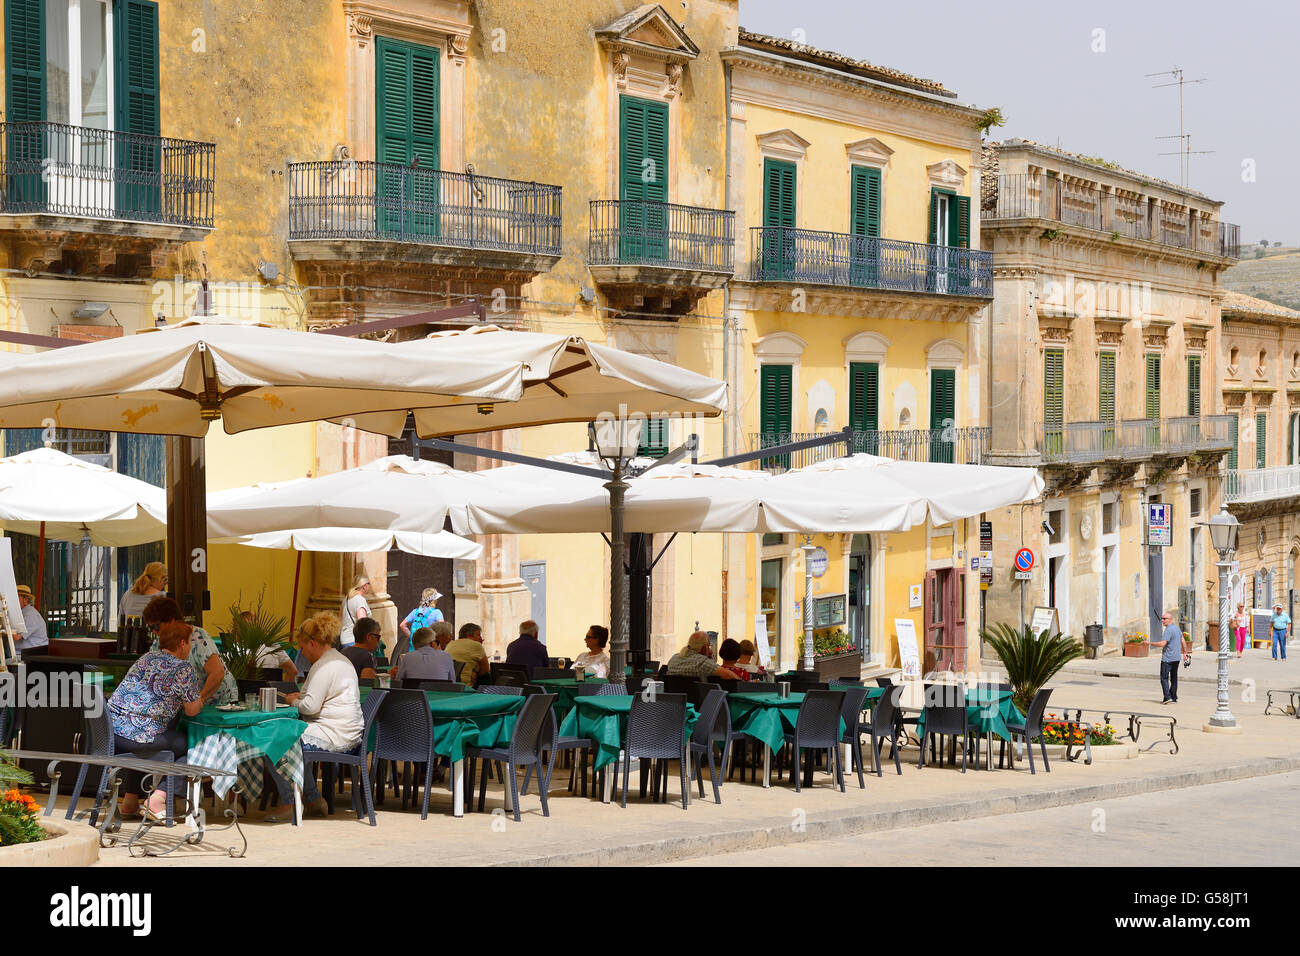 Straßencafés in Piazza Duomo in Ragusa Ibla, Sizilien, Italien Stockbild